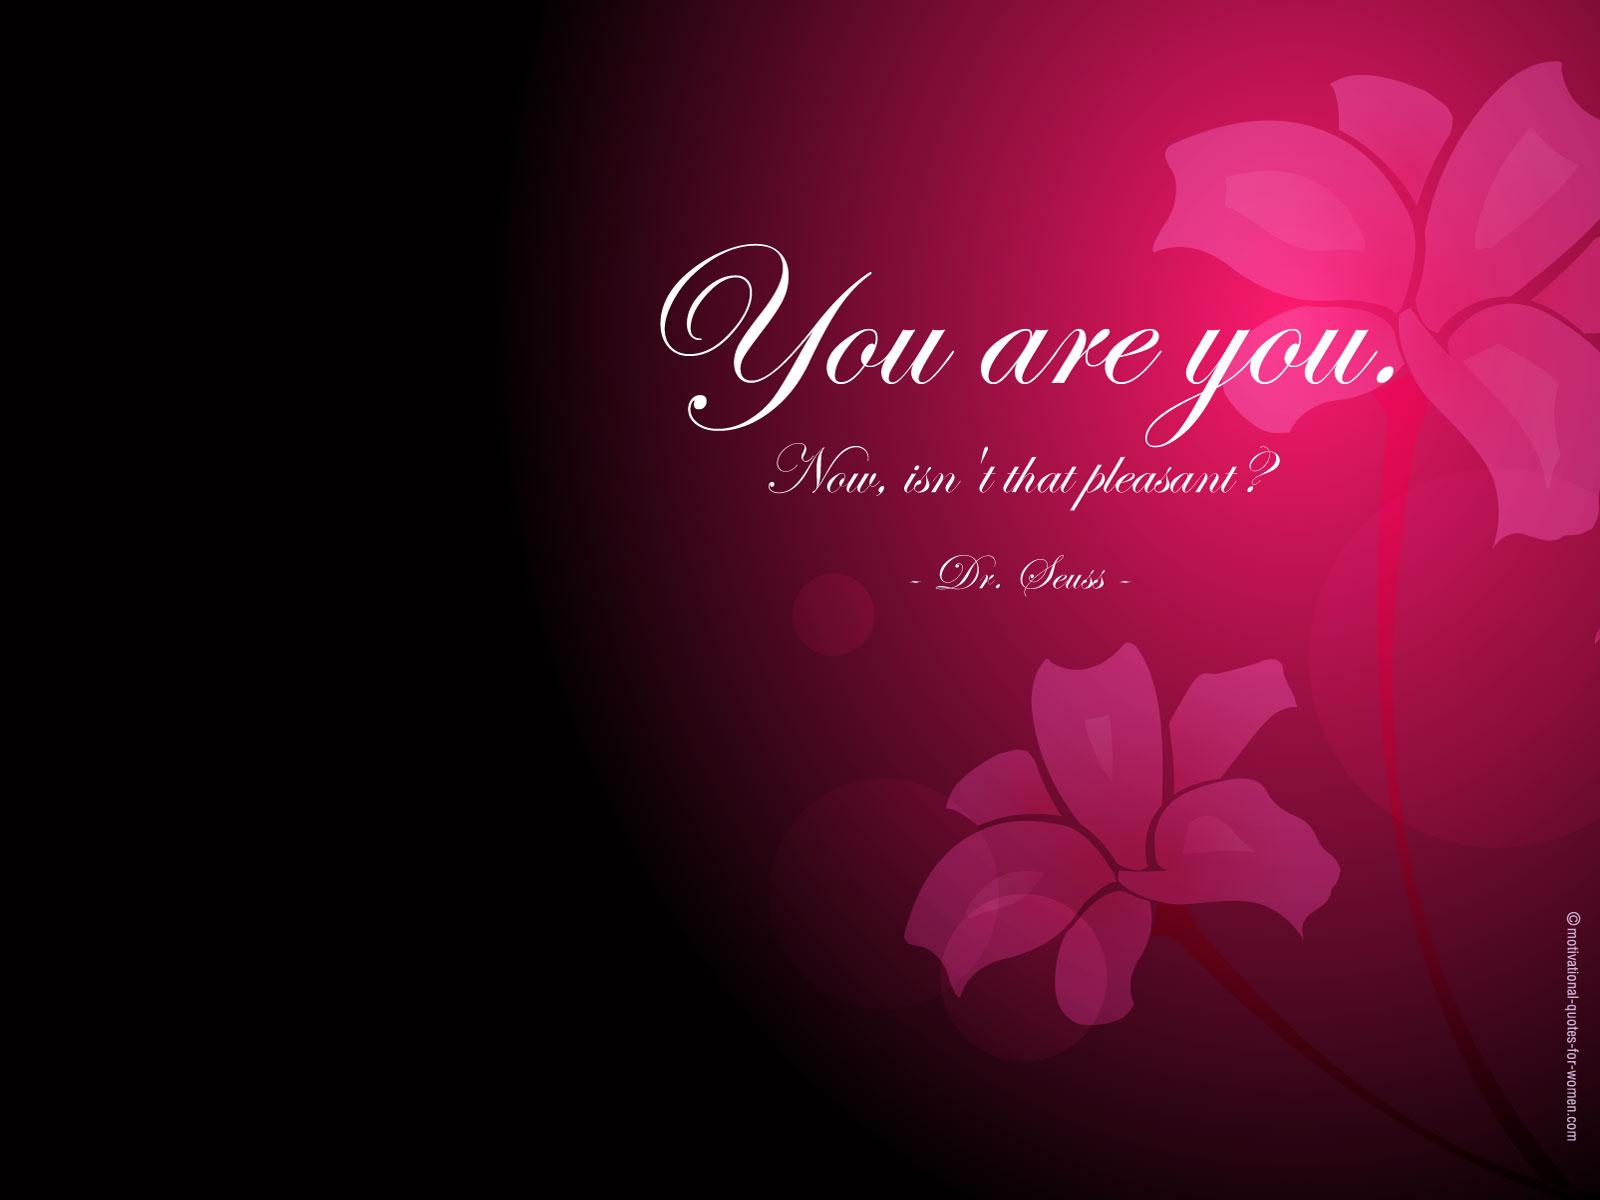 Motivational Quotes Desktop Wallpaper Download HD Wallpapers 1600x1200